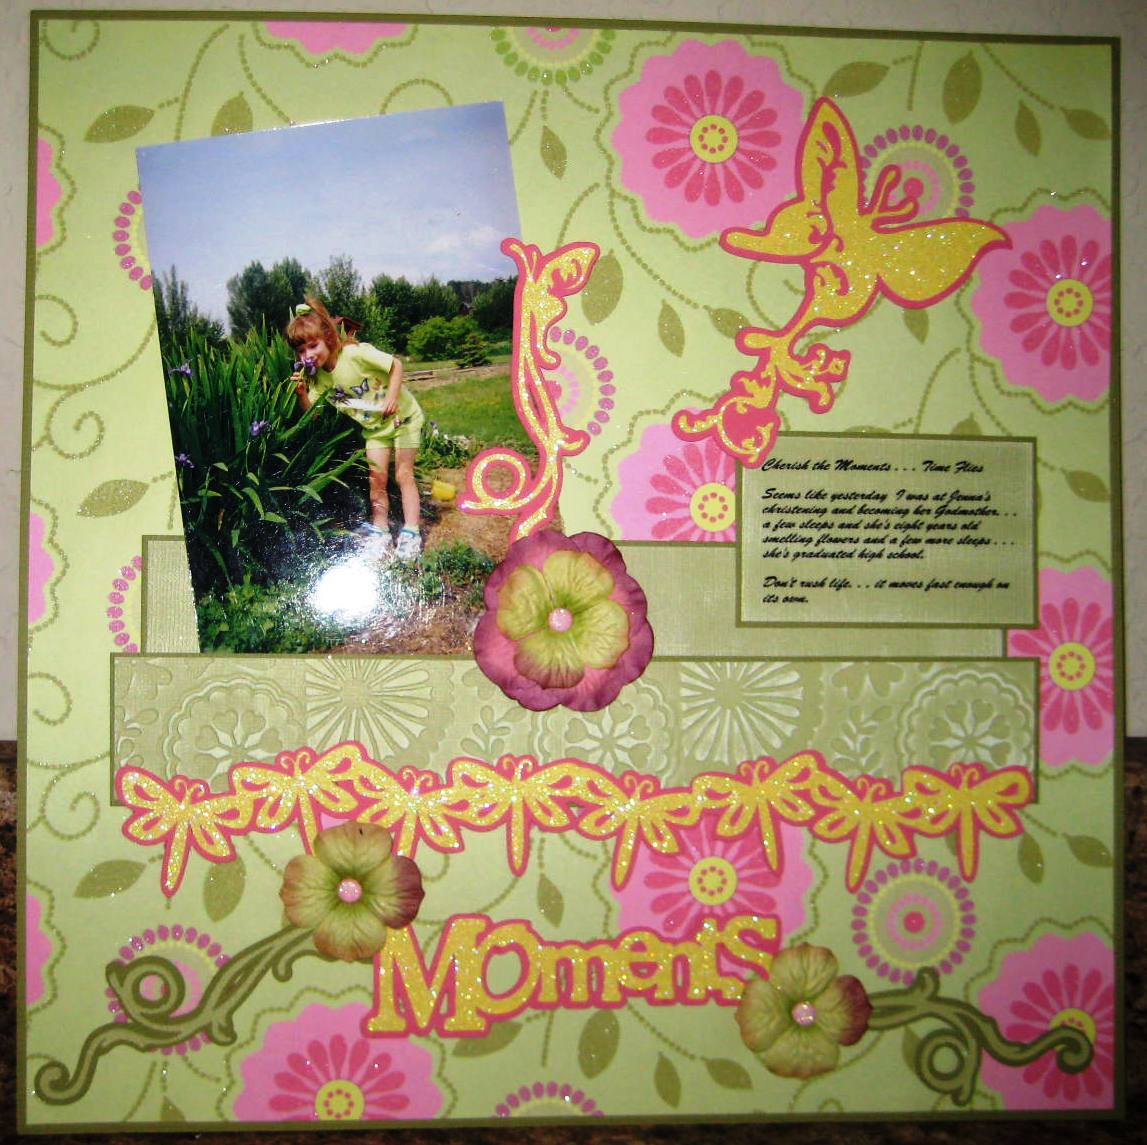 http://4.bp.blogspot.com/_Vid-7YlUzPk/TFctMIRqnqI/AAAAAAAAIyA/R3RlTZBtp9Q/s1600/Yvonne.jpg